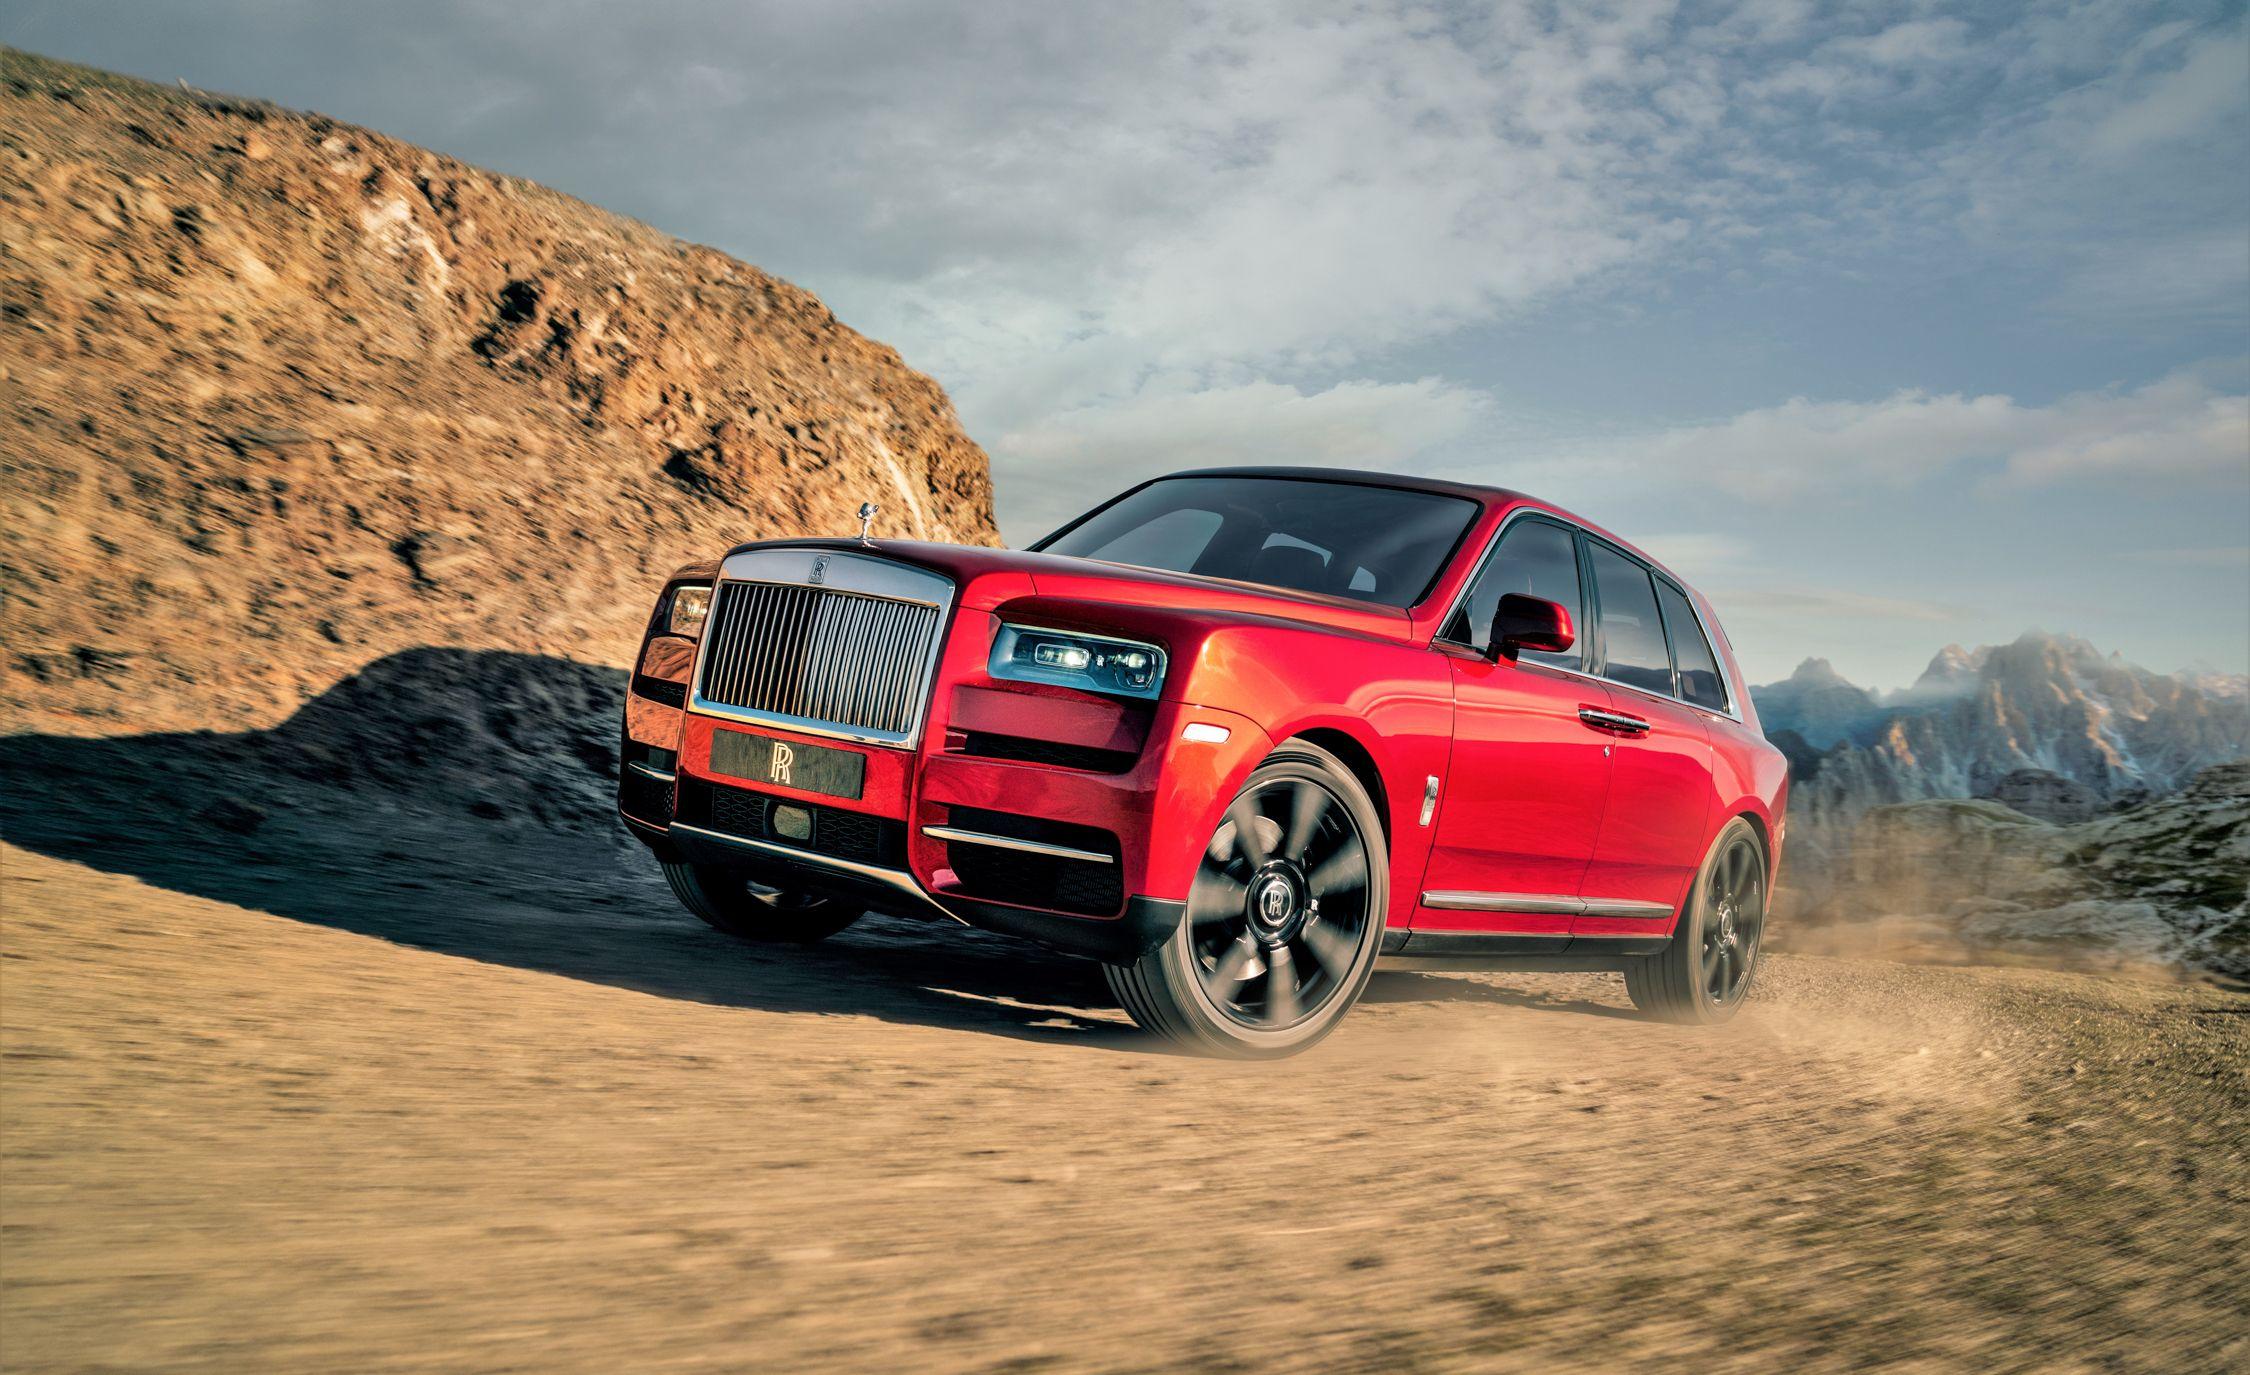 Future Rolls-Royce Cullinans: Definitely No V-8, but an EV Looks Likely